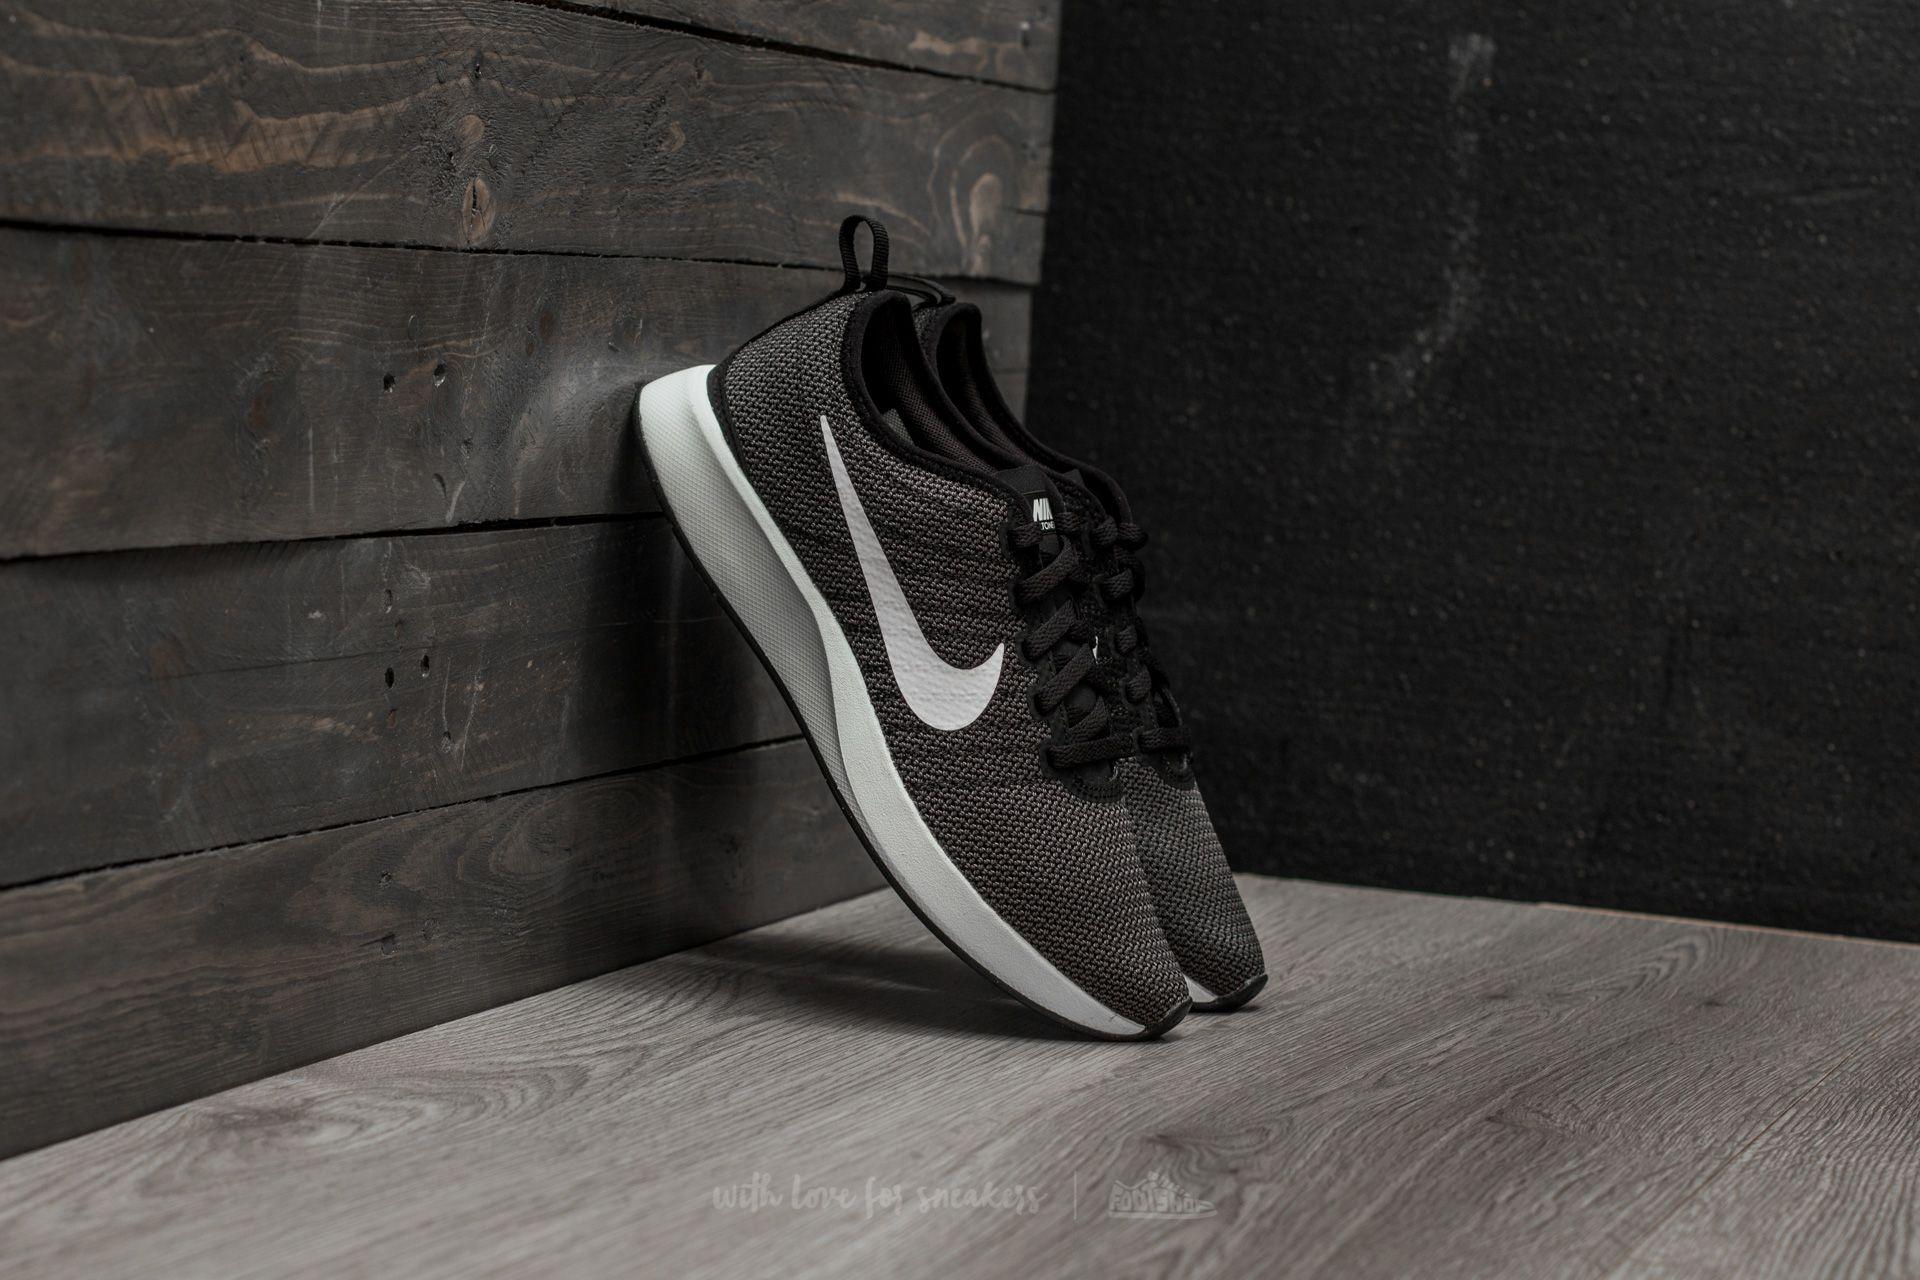 e0e3eb0e996 Nike Wmns Dualtone Racer Black  White-Dark Grey at a great price 63 €